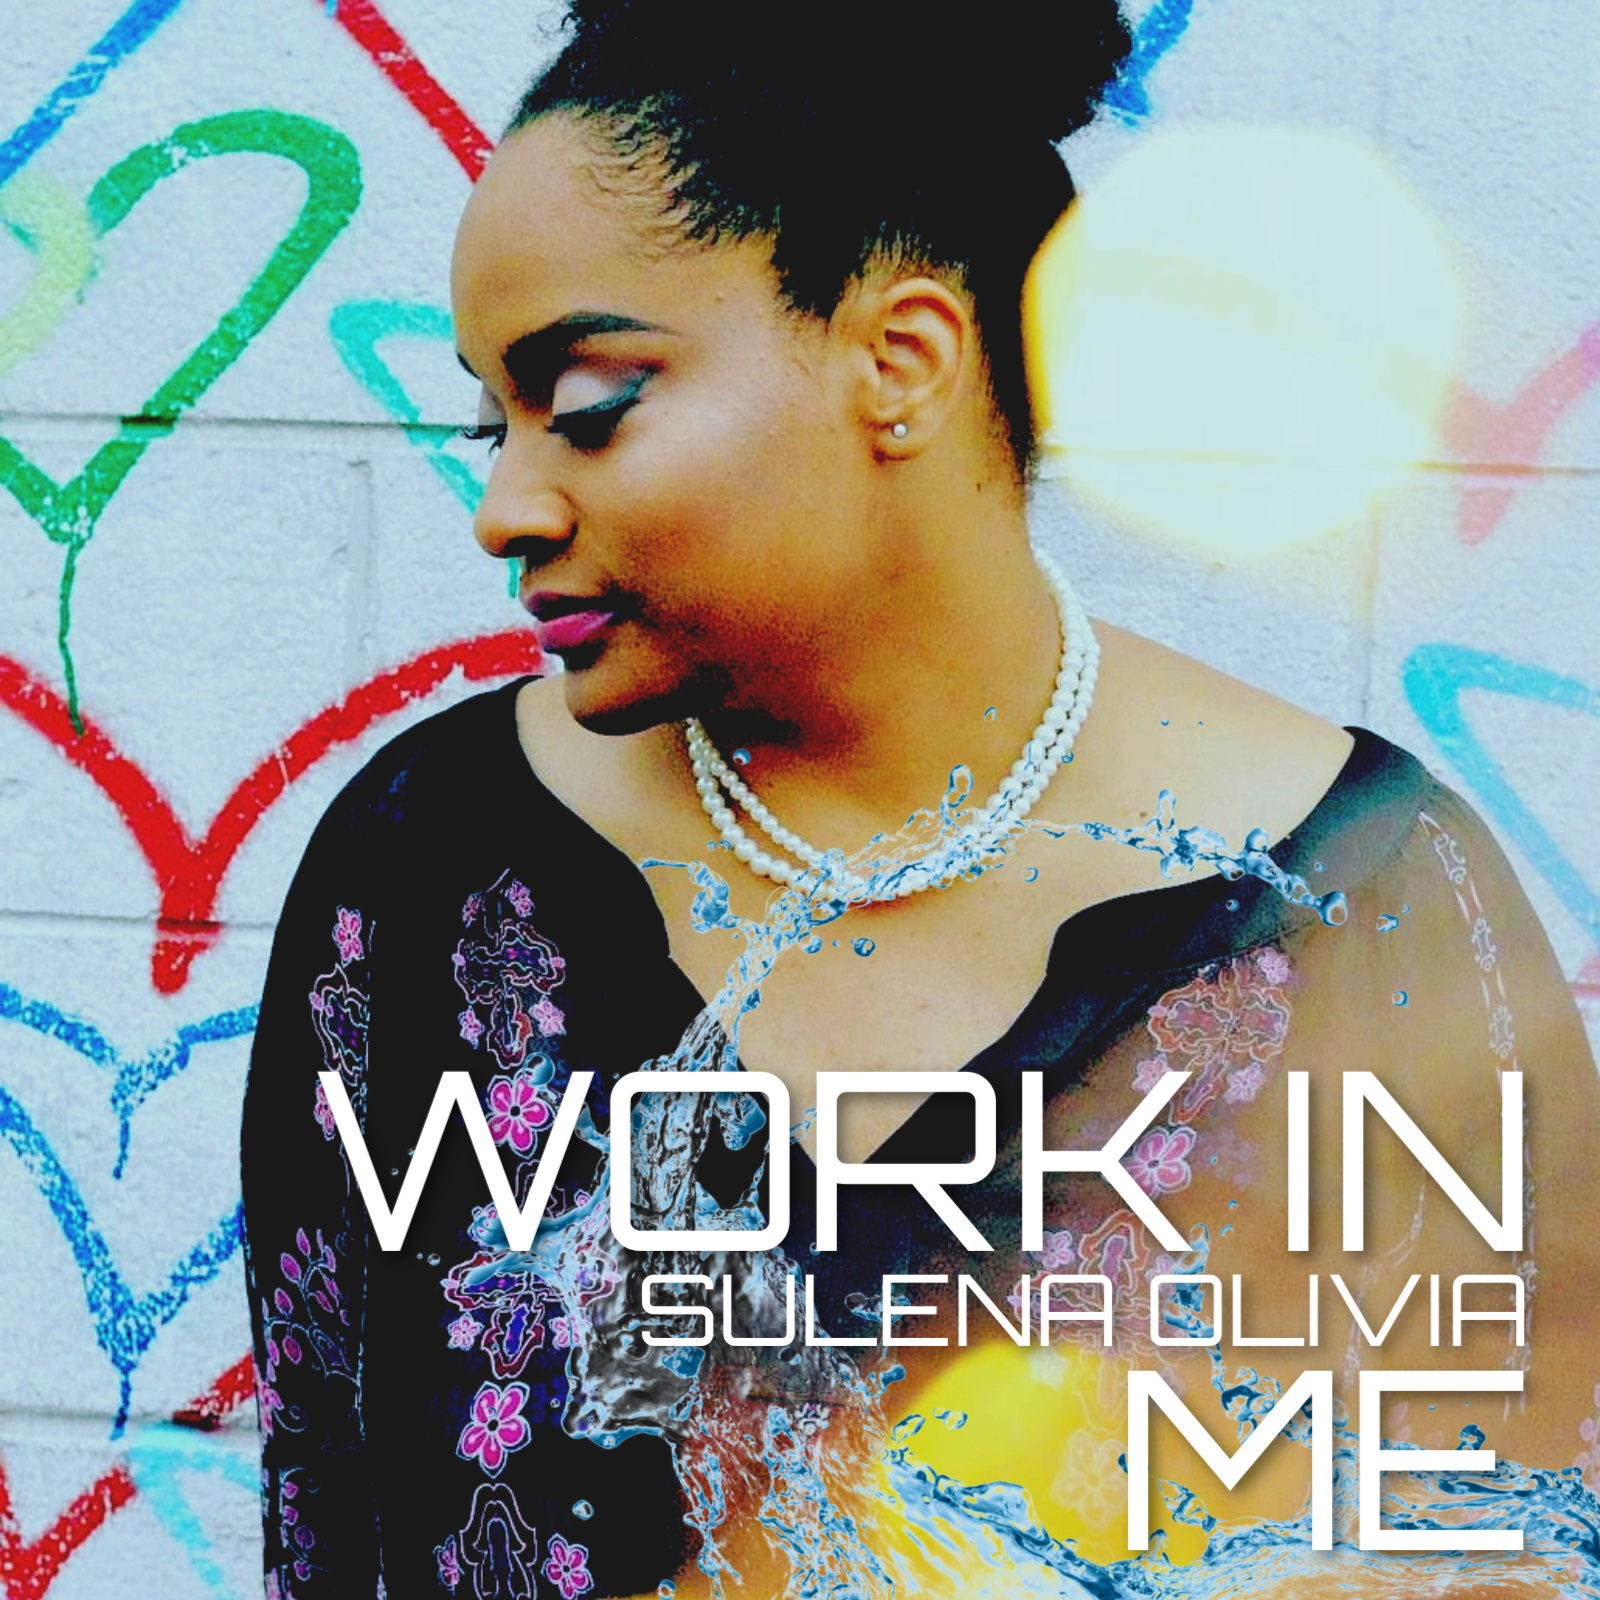 MUSIC: Work In Me (Single)